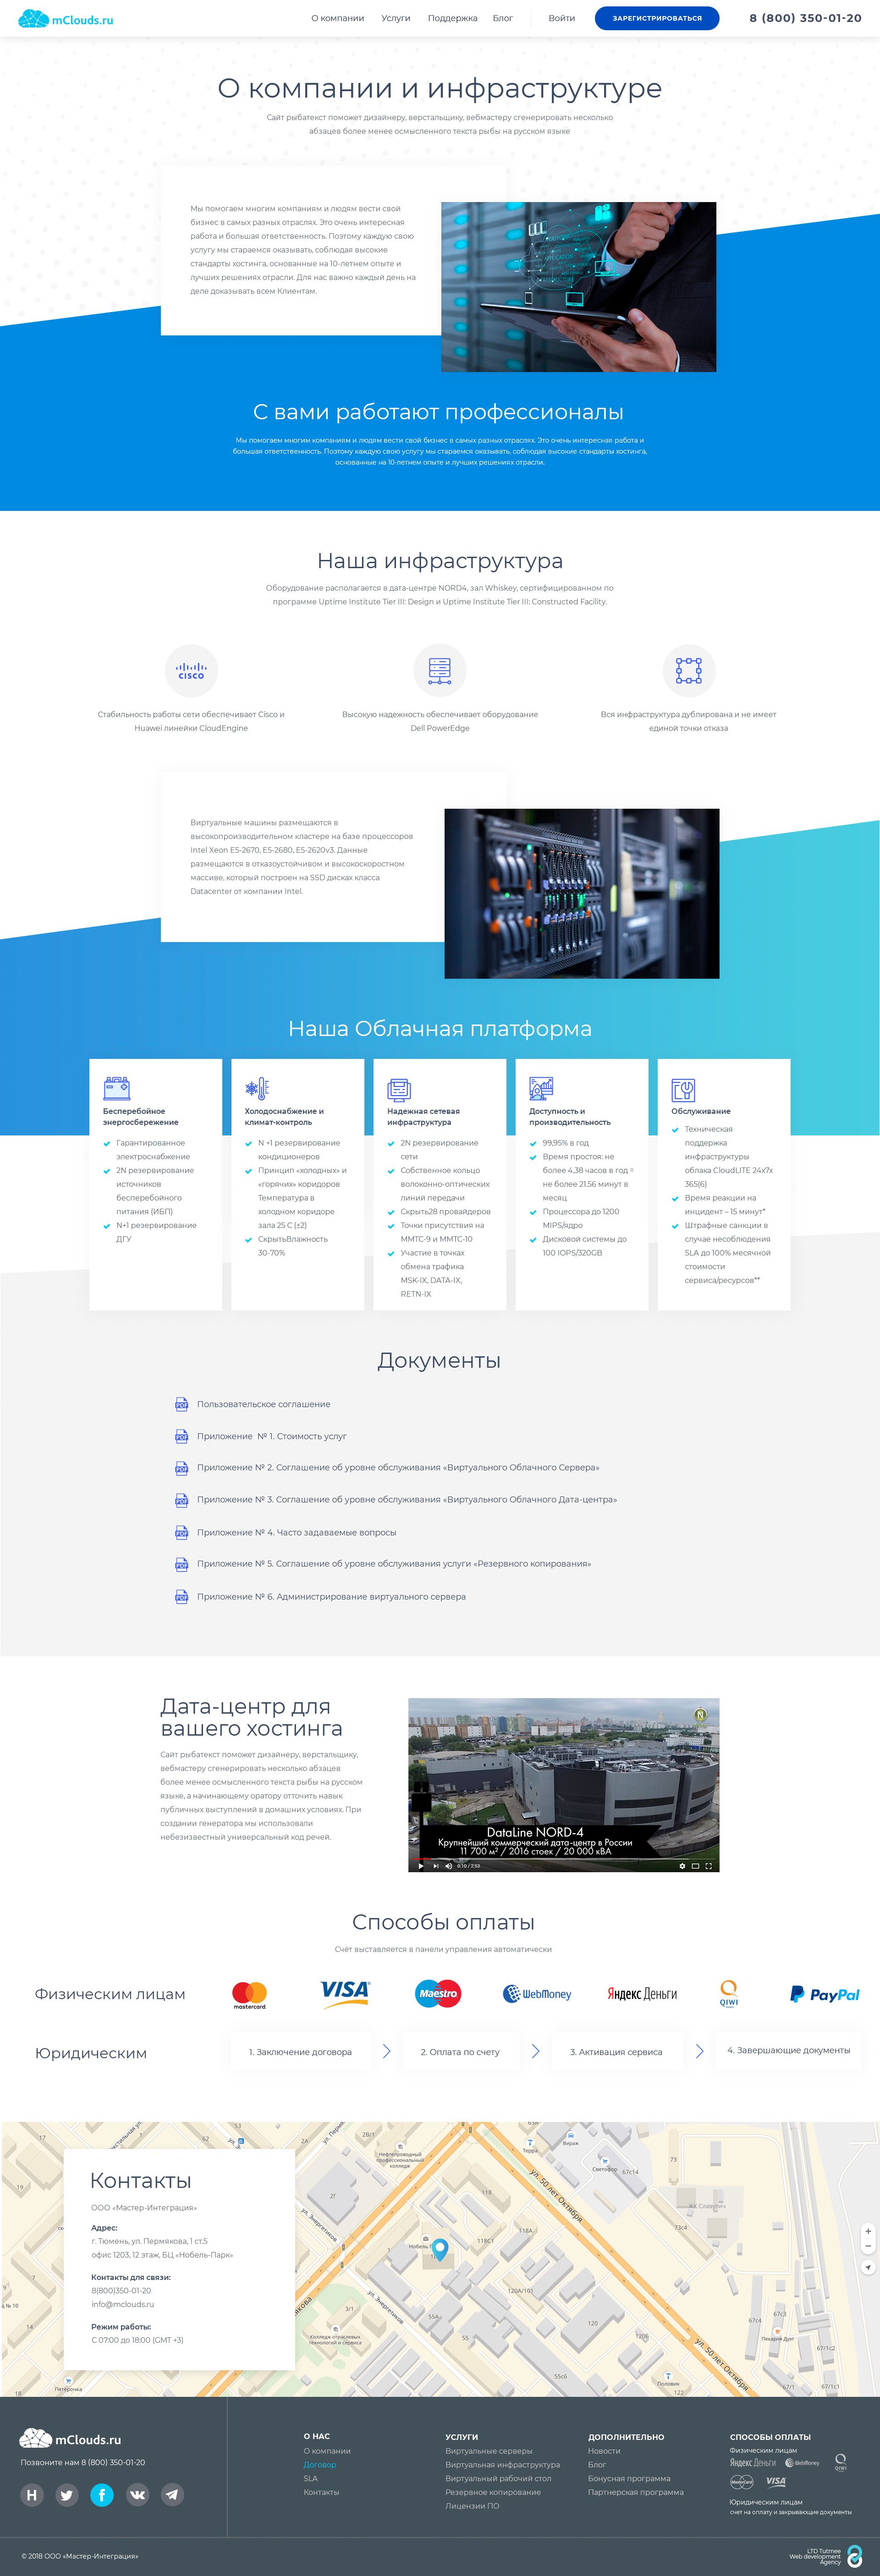 Сайт под ключ mClouds - Облачный хостинг провайдер